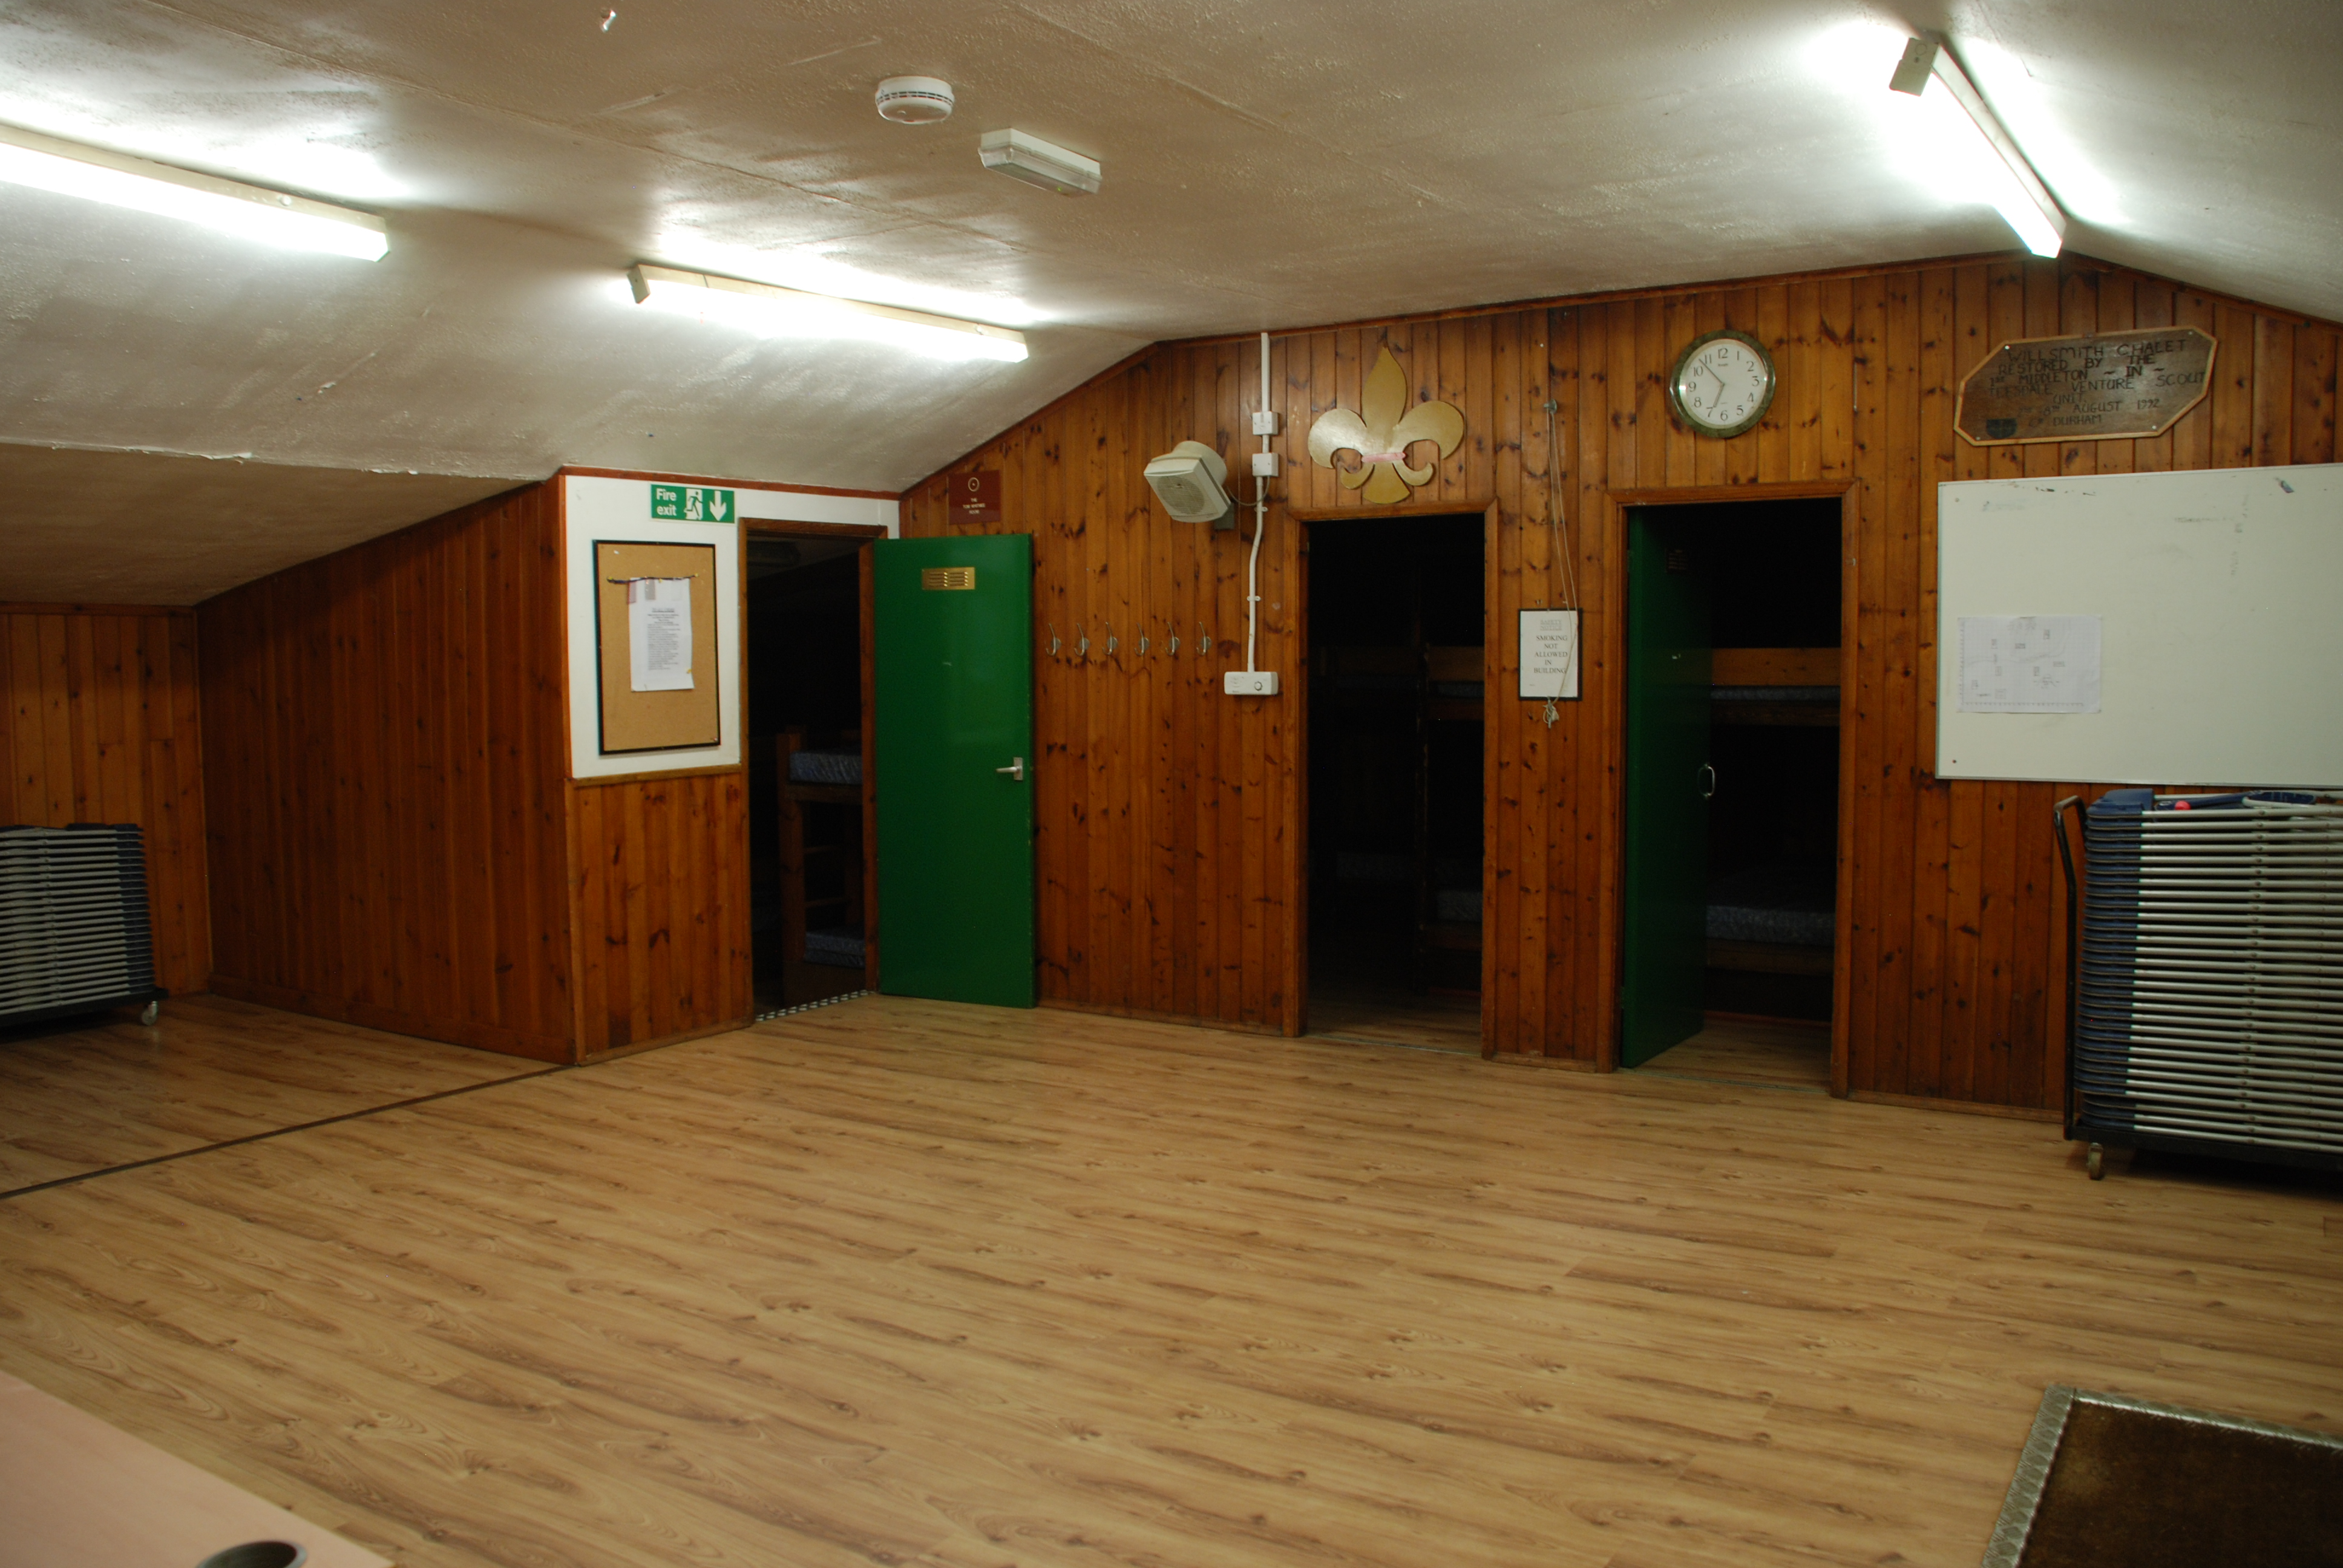 Will Smith hall